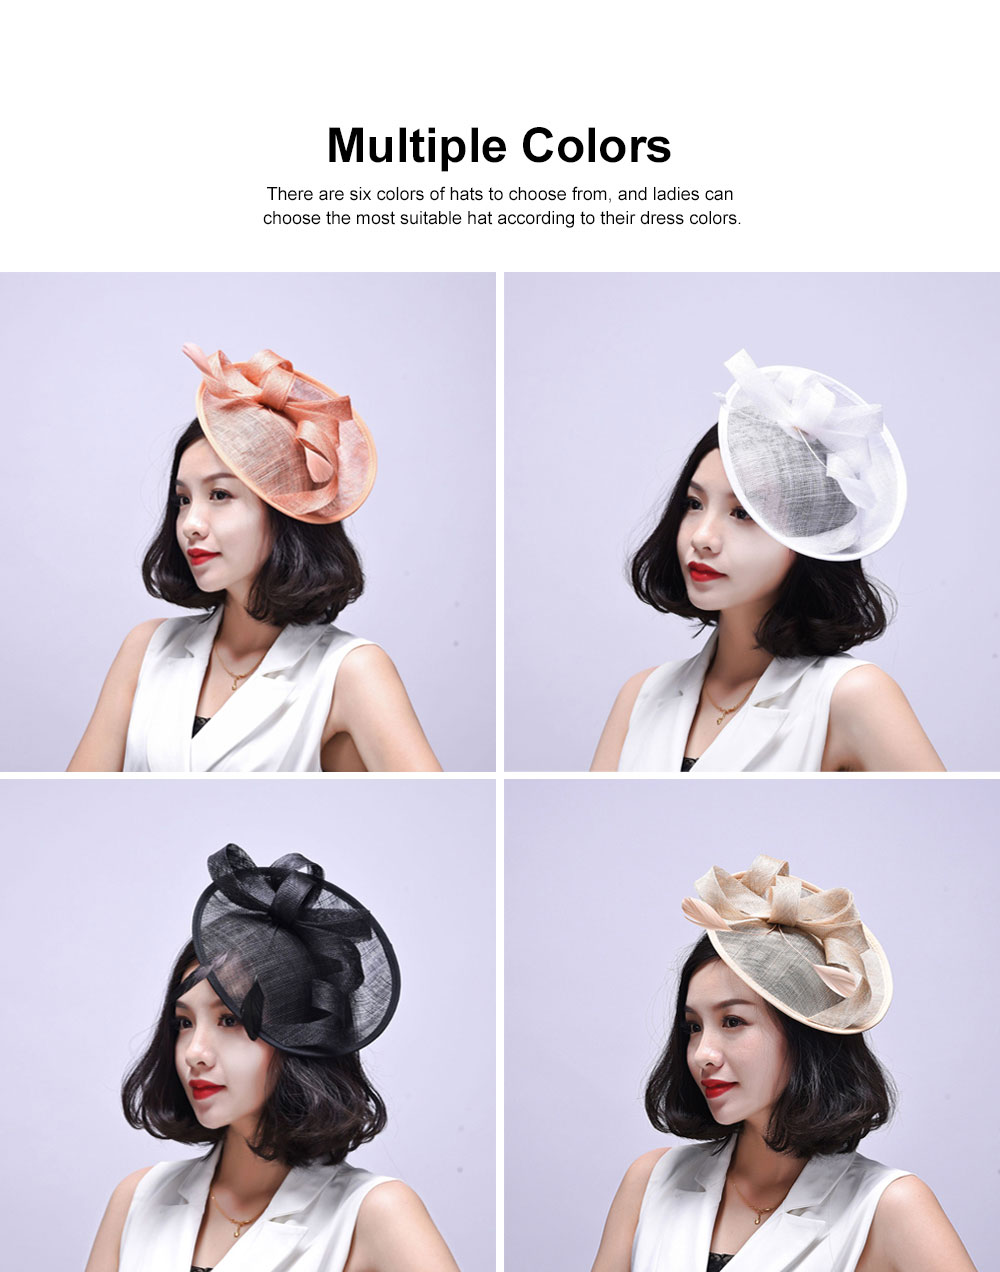 Women Headdress, Horse Riding Yarn Bowknot Feather Top Hat, Banquet Wedding Accessory Headwear 1